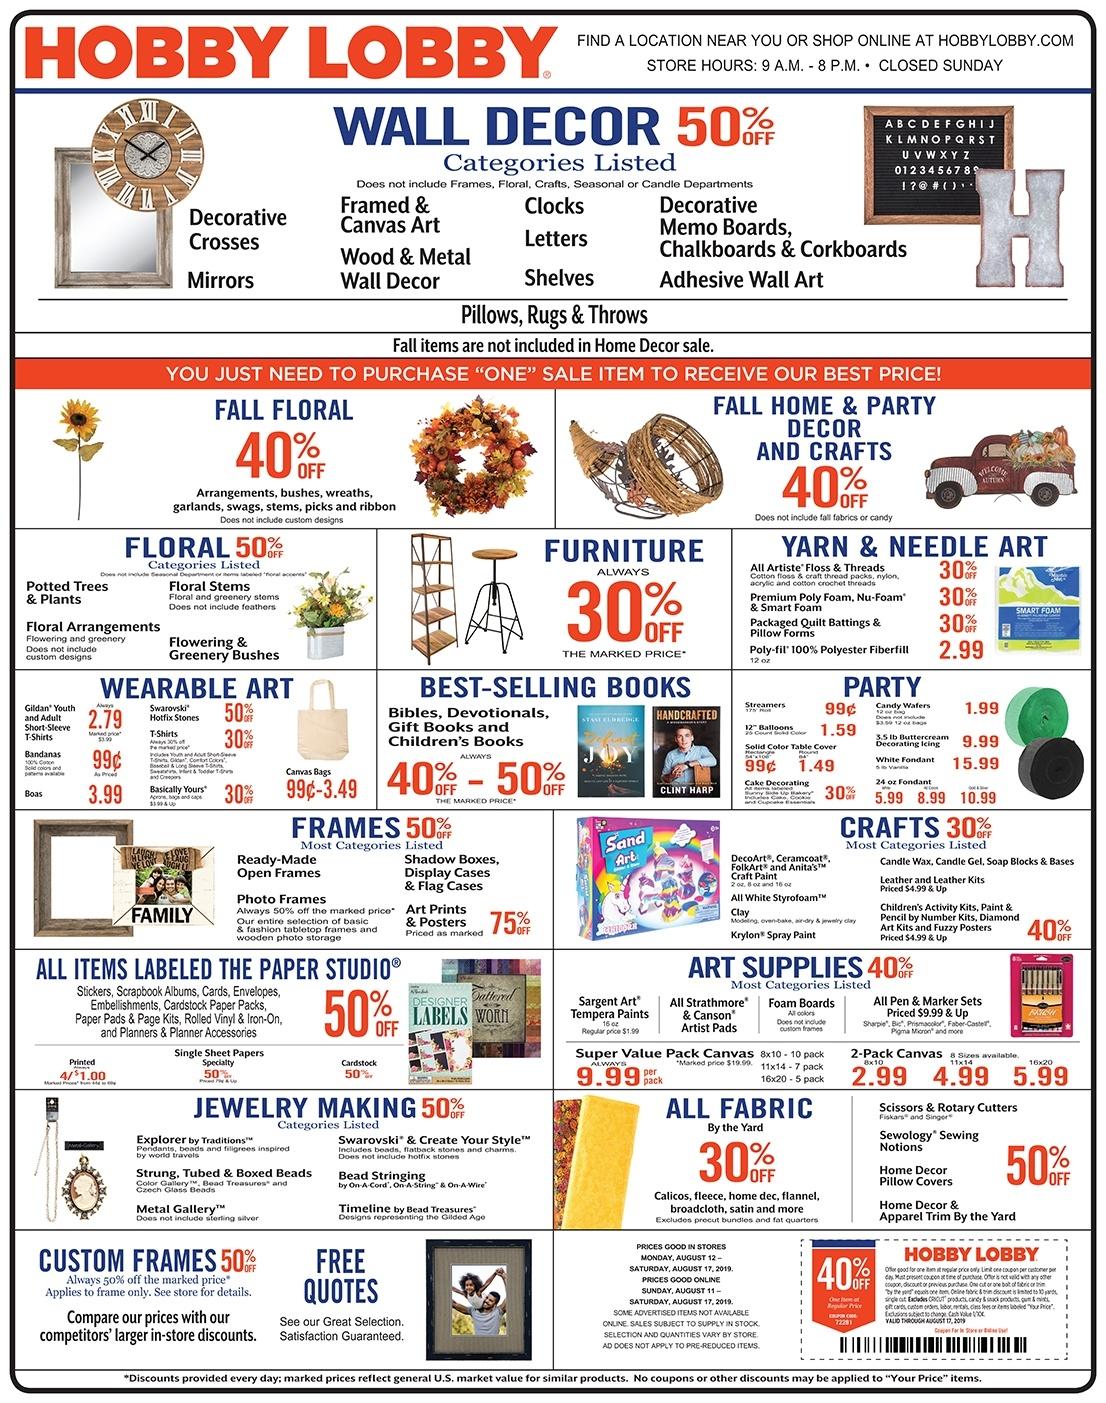 Weekly Ad & Coupon_Blank Calendar Hobby Lobby